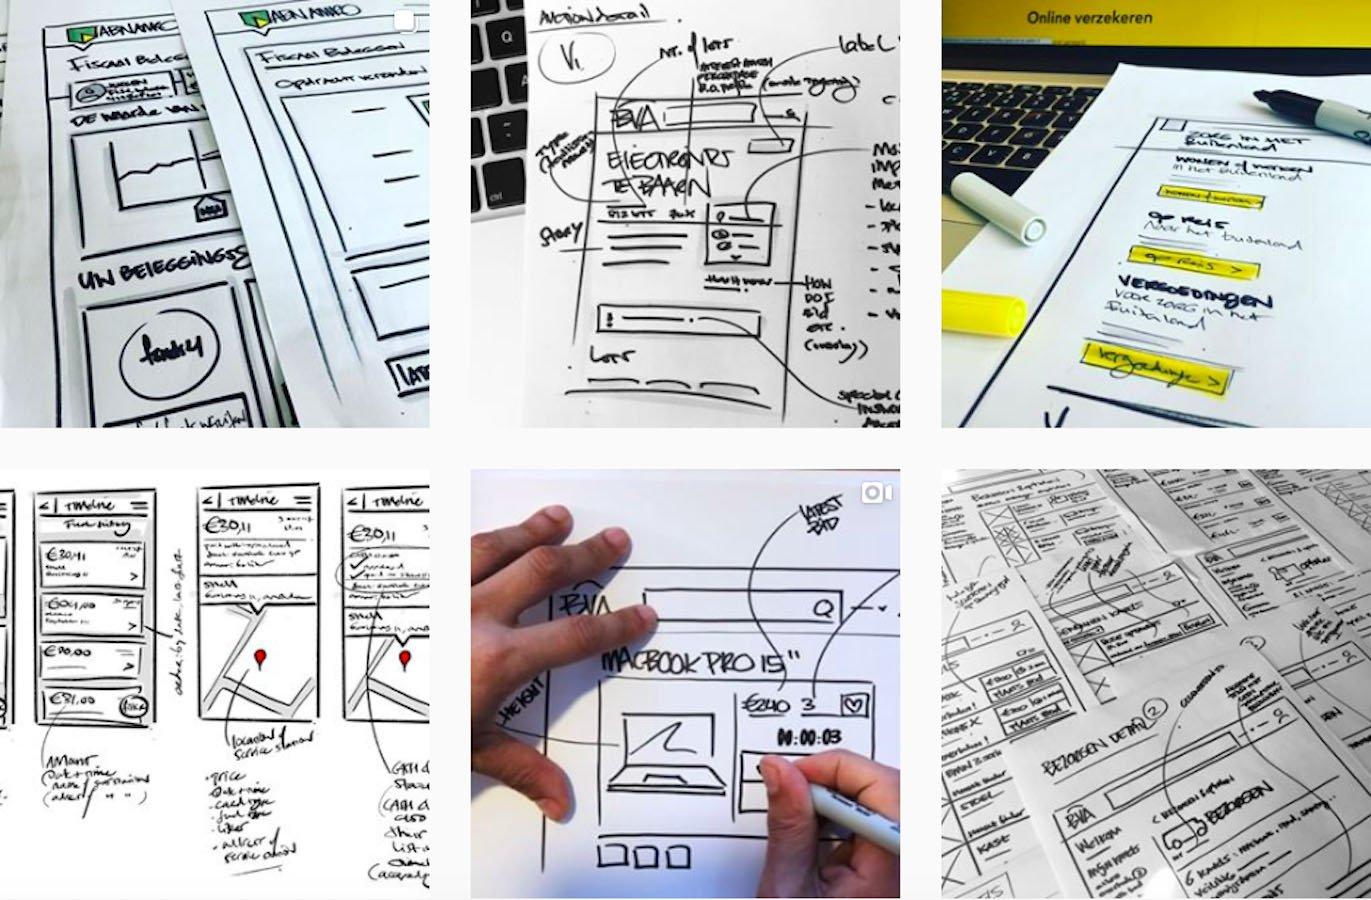 Web Design Inspiration: 110+ Accounts On Instagram and 10+ Best UX & Web Design Books in 2020 - uxjurgen